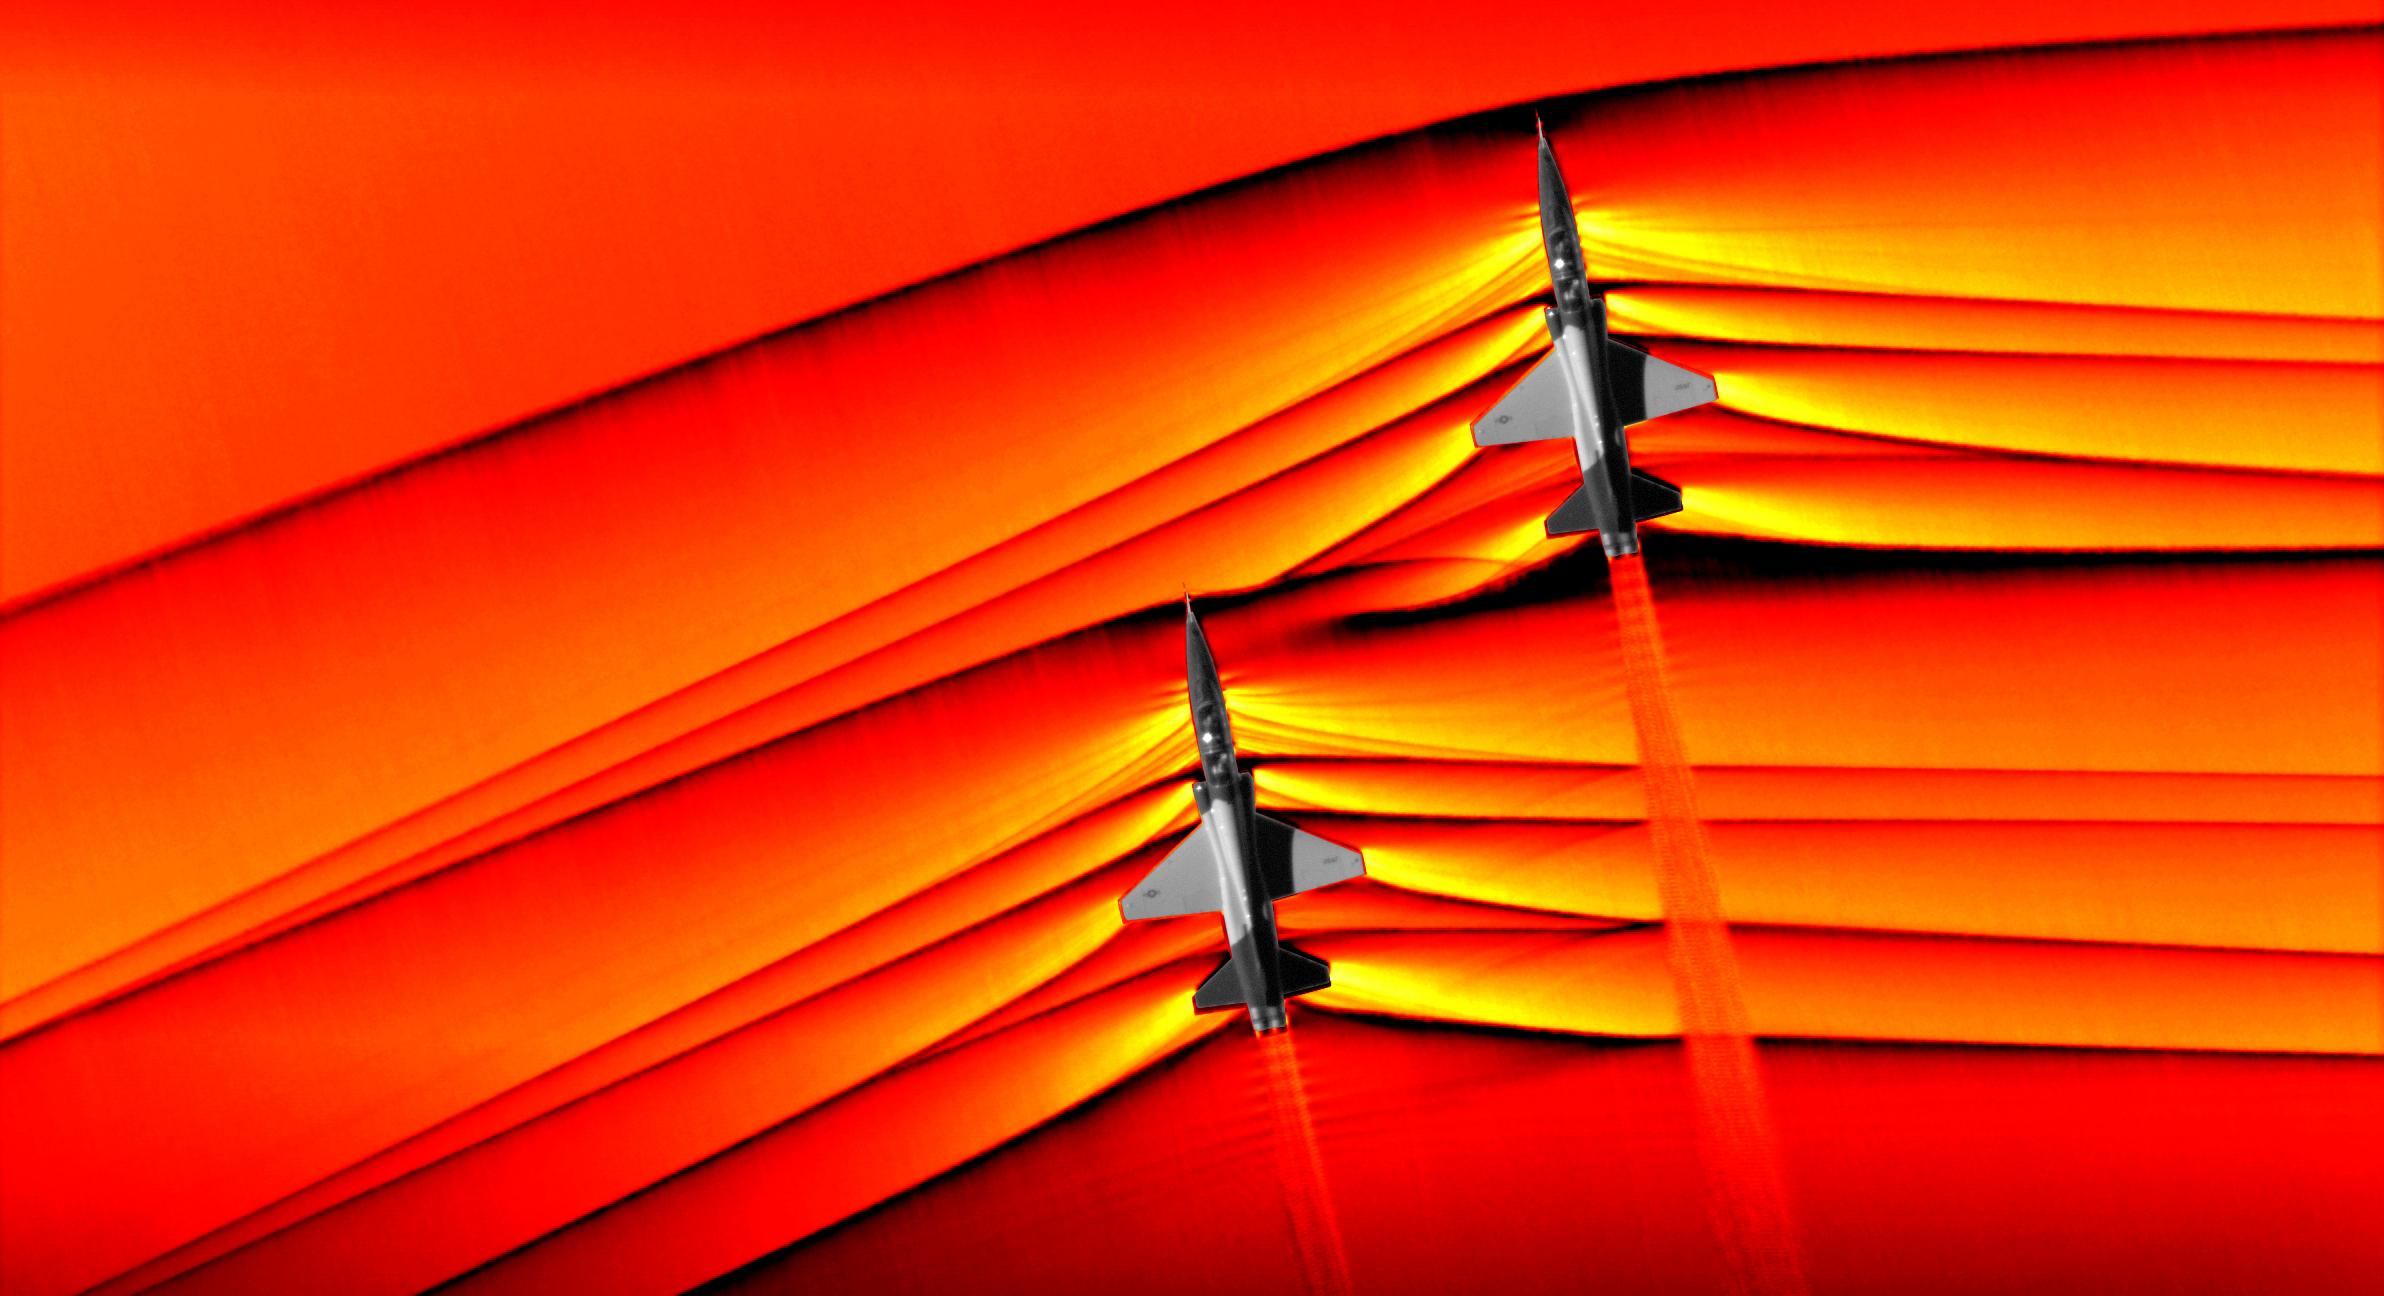 f4 p4 red planedrop